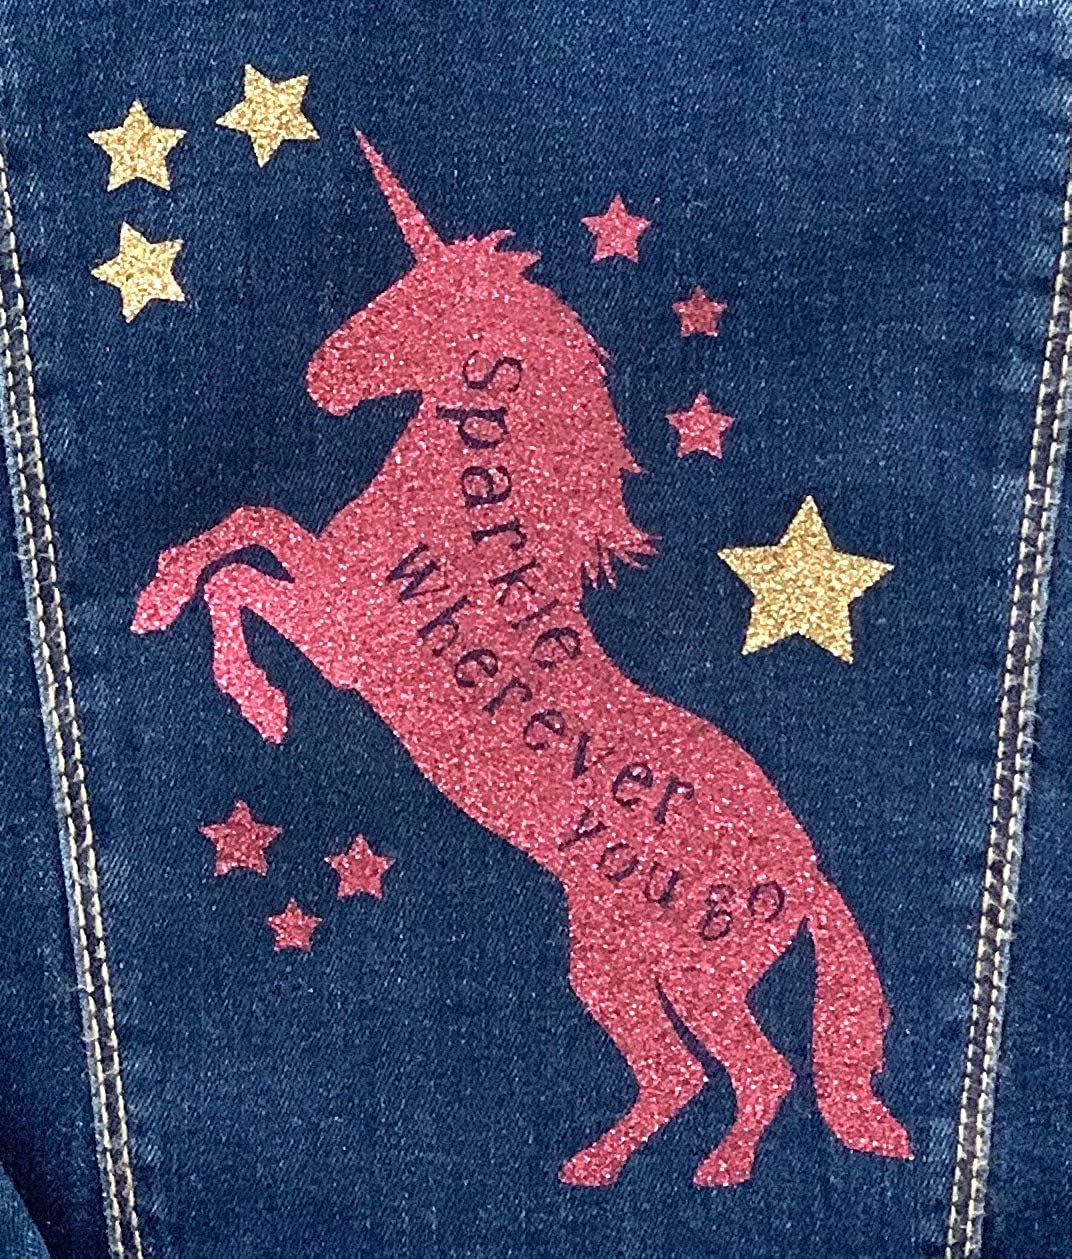 Personalized Toddler Sparkle Unicorn Denim Jacket Kids Jean Jackets Kids Birthday Gift Toddler Custom Gifts